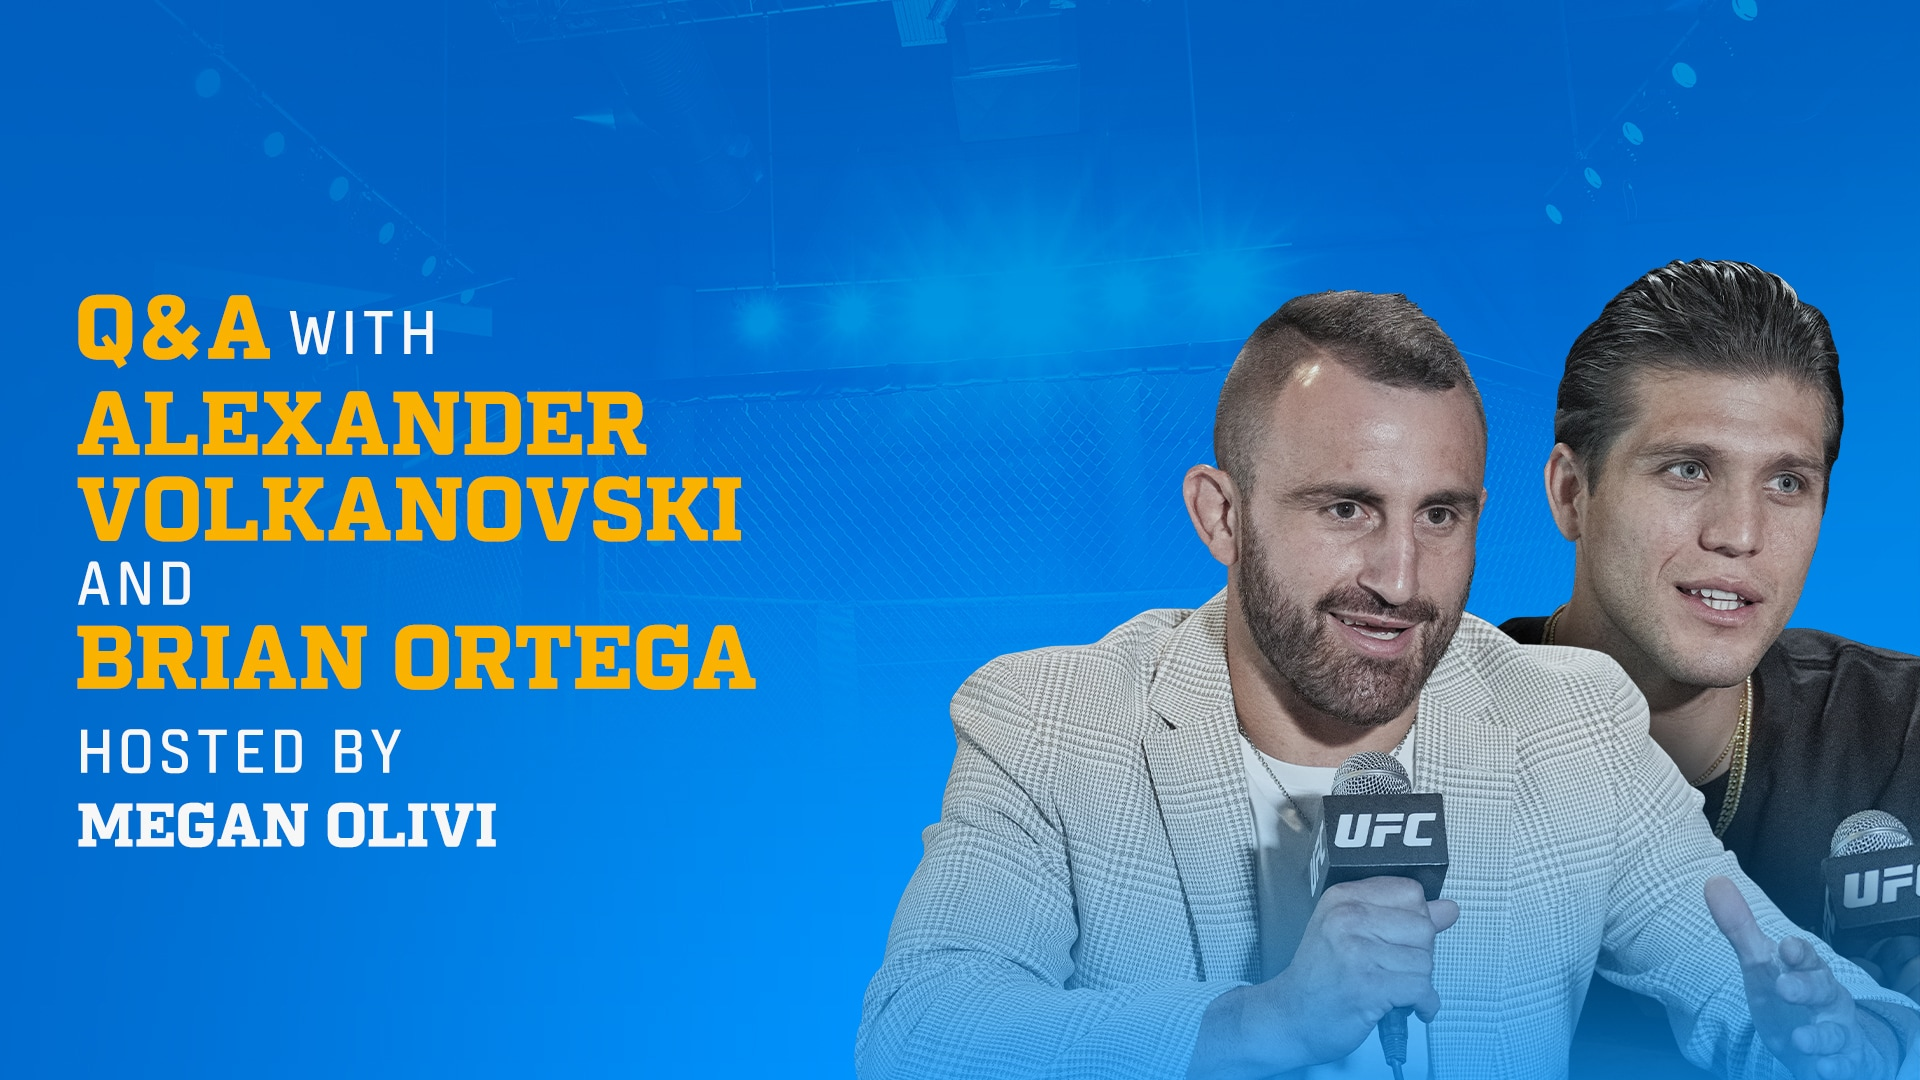 ESPN+ Fan Access: Live Fight Week Q&A with UFC's Volkanovski, Ortega